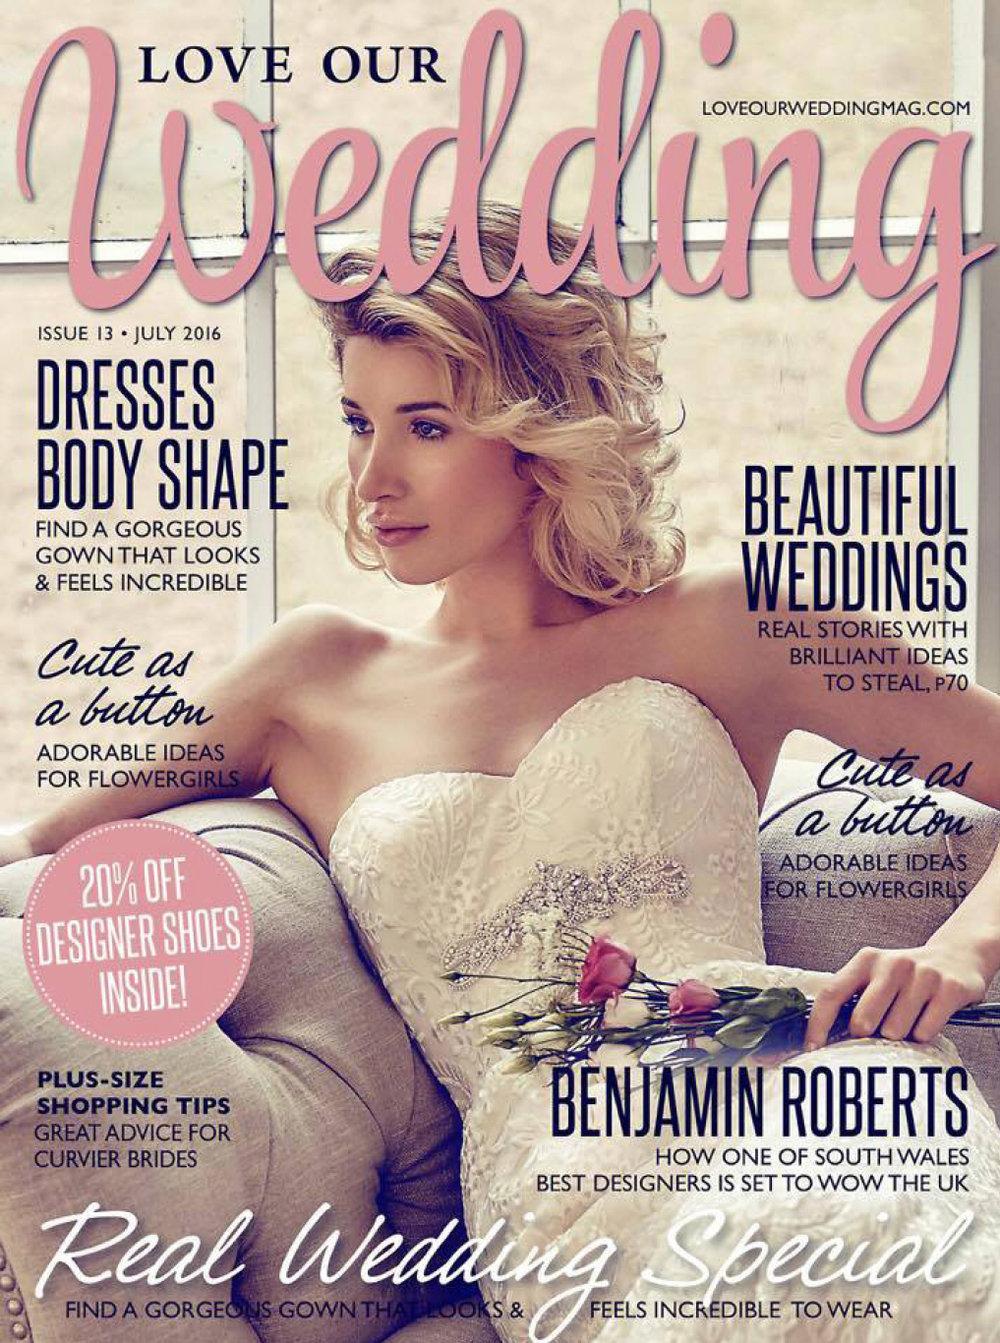 loveourweddingmagazine_advertising_photography.jpg